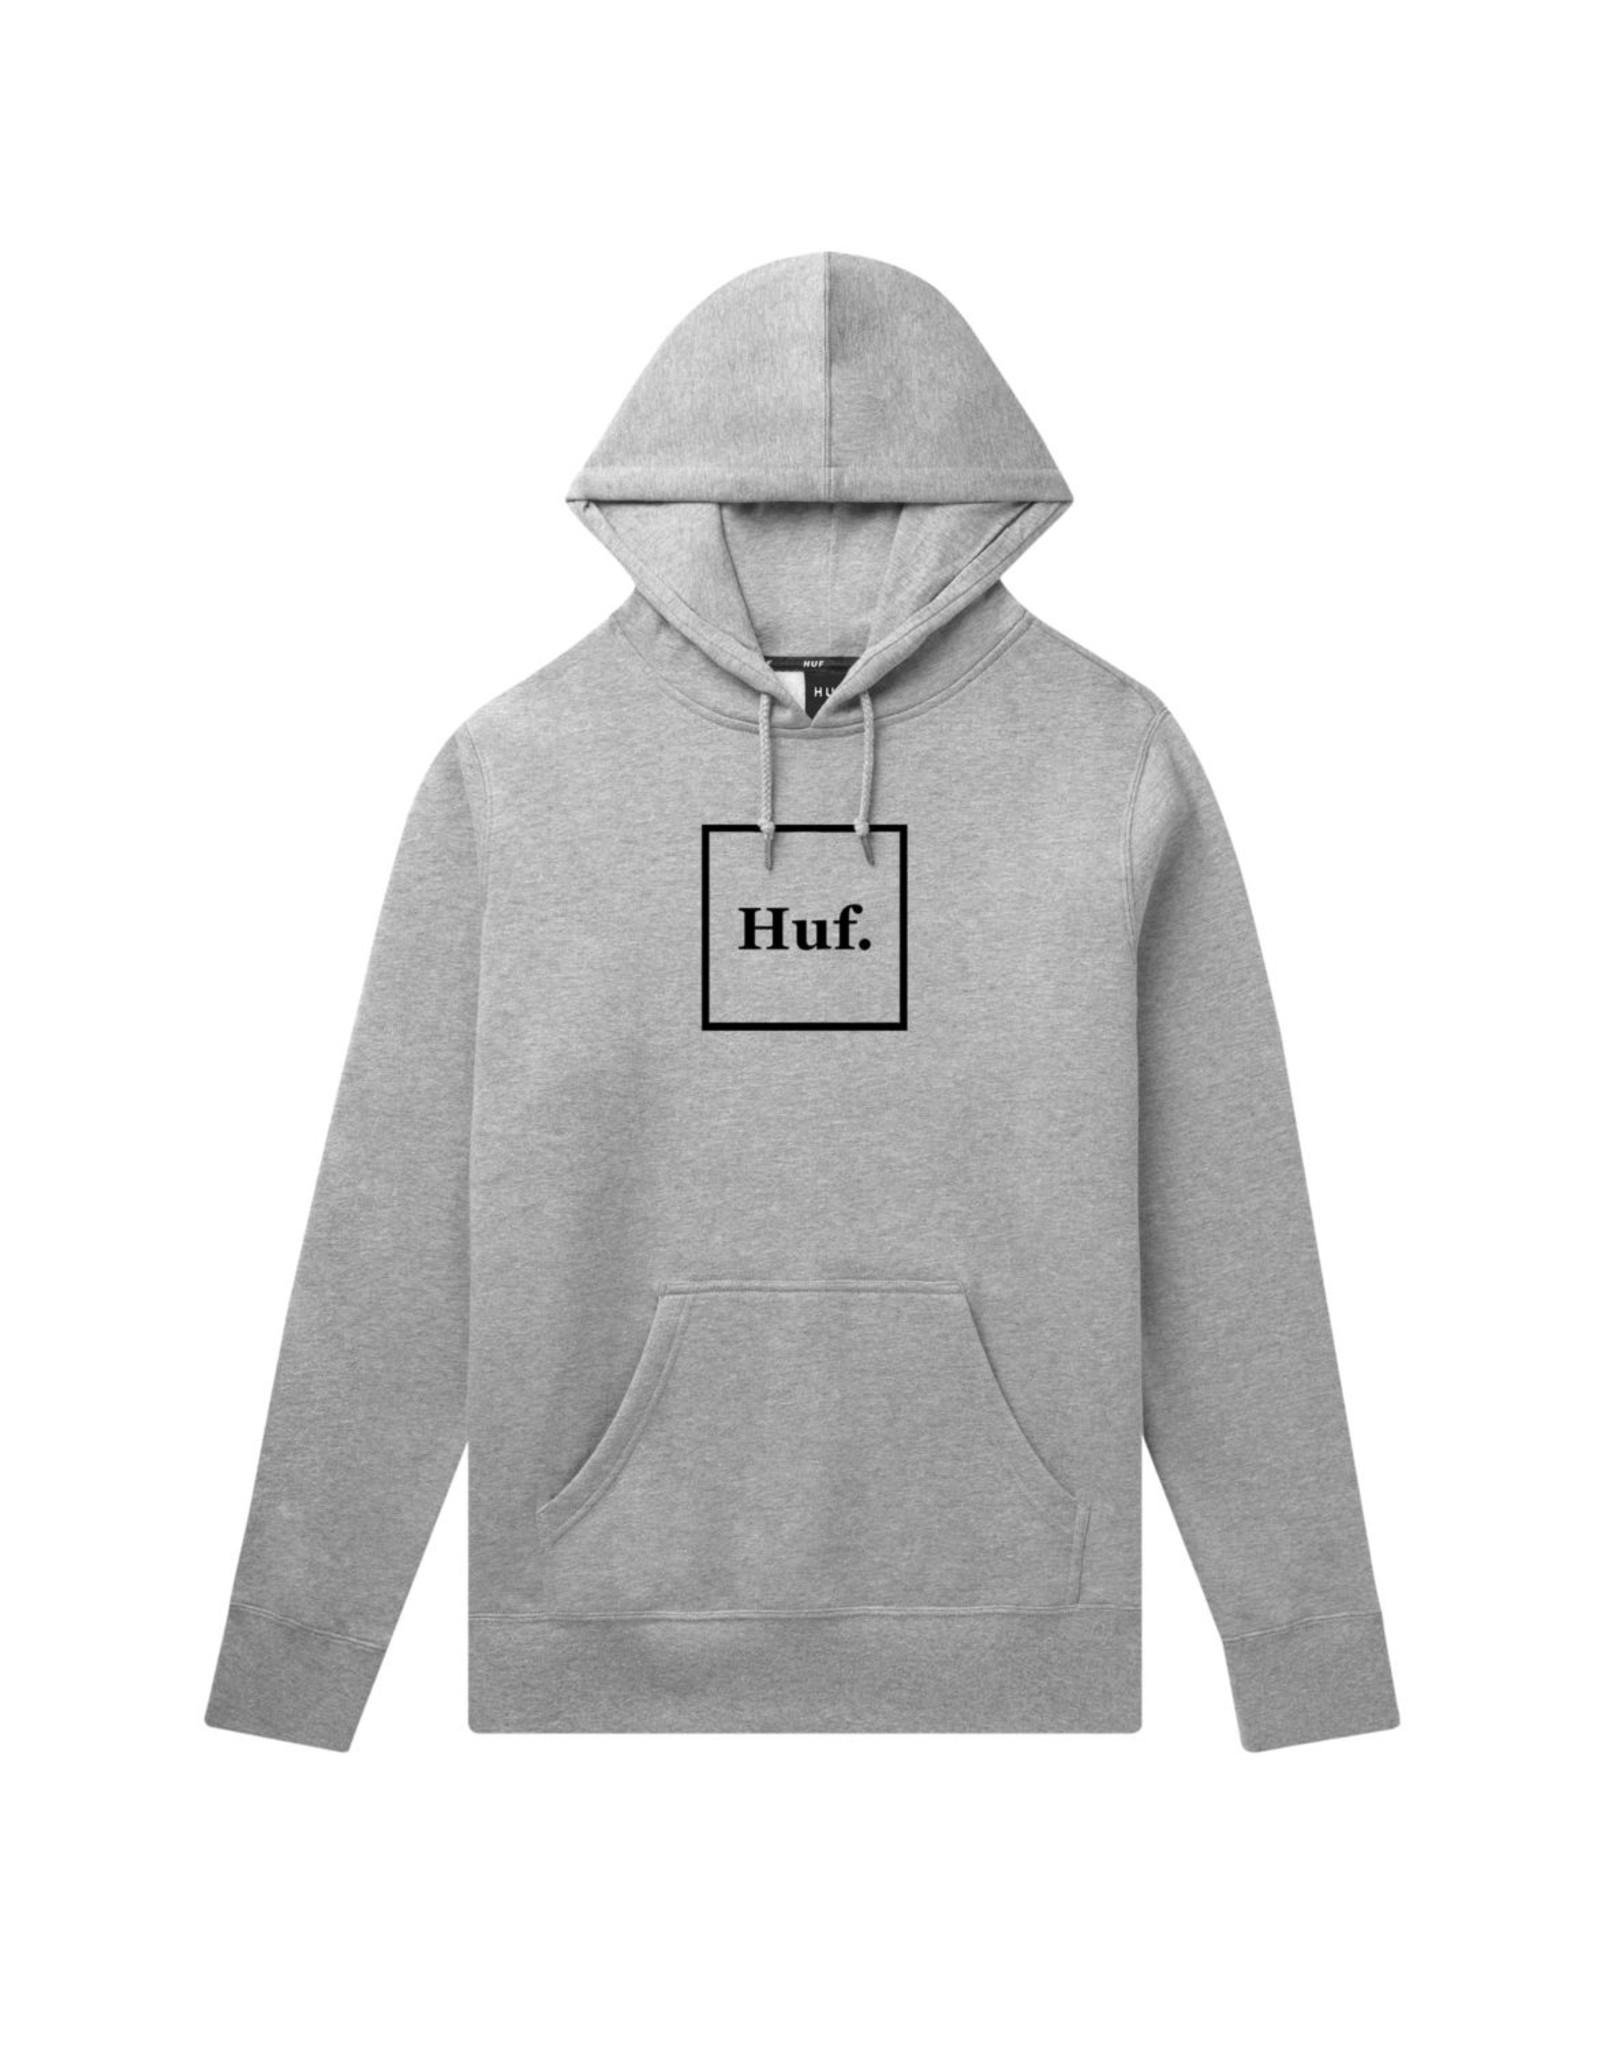 HUF Box Logo Pullover Hoodie HUF Grey Heather